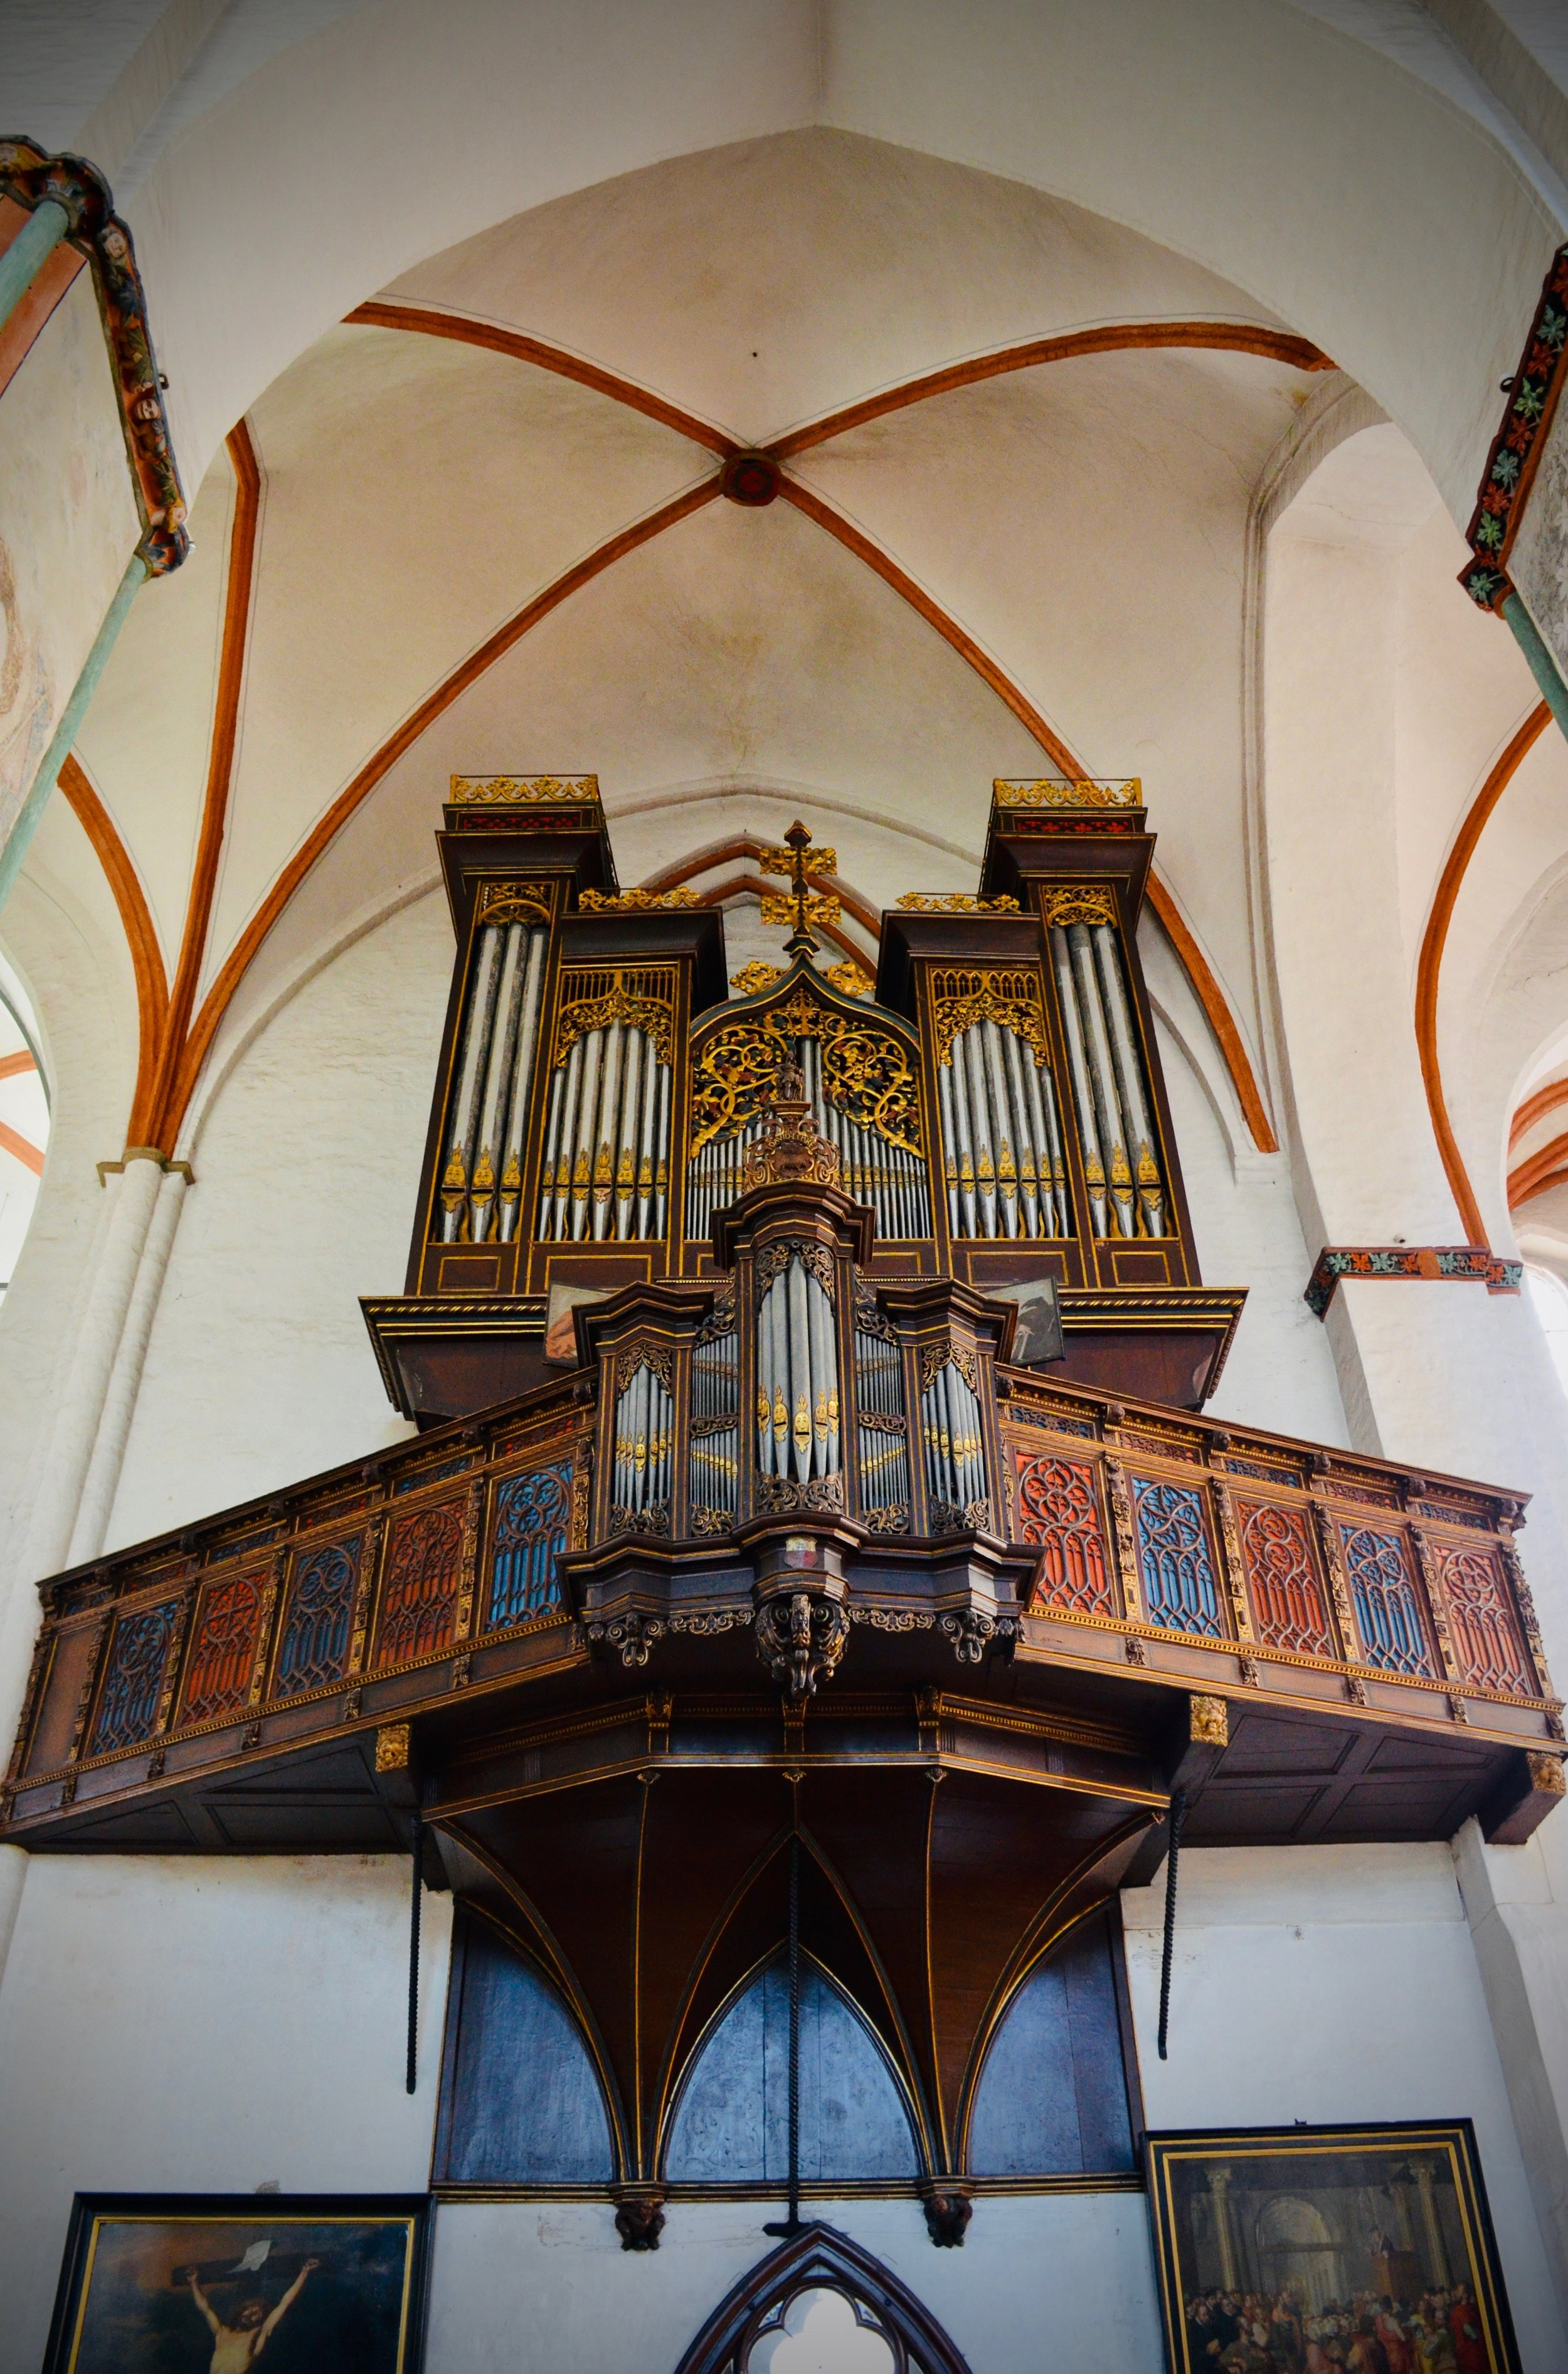 1637 Stellwagen Organ, St. Jakobi, Lübeck.